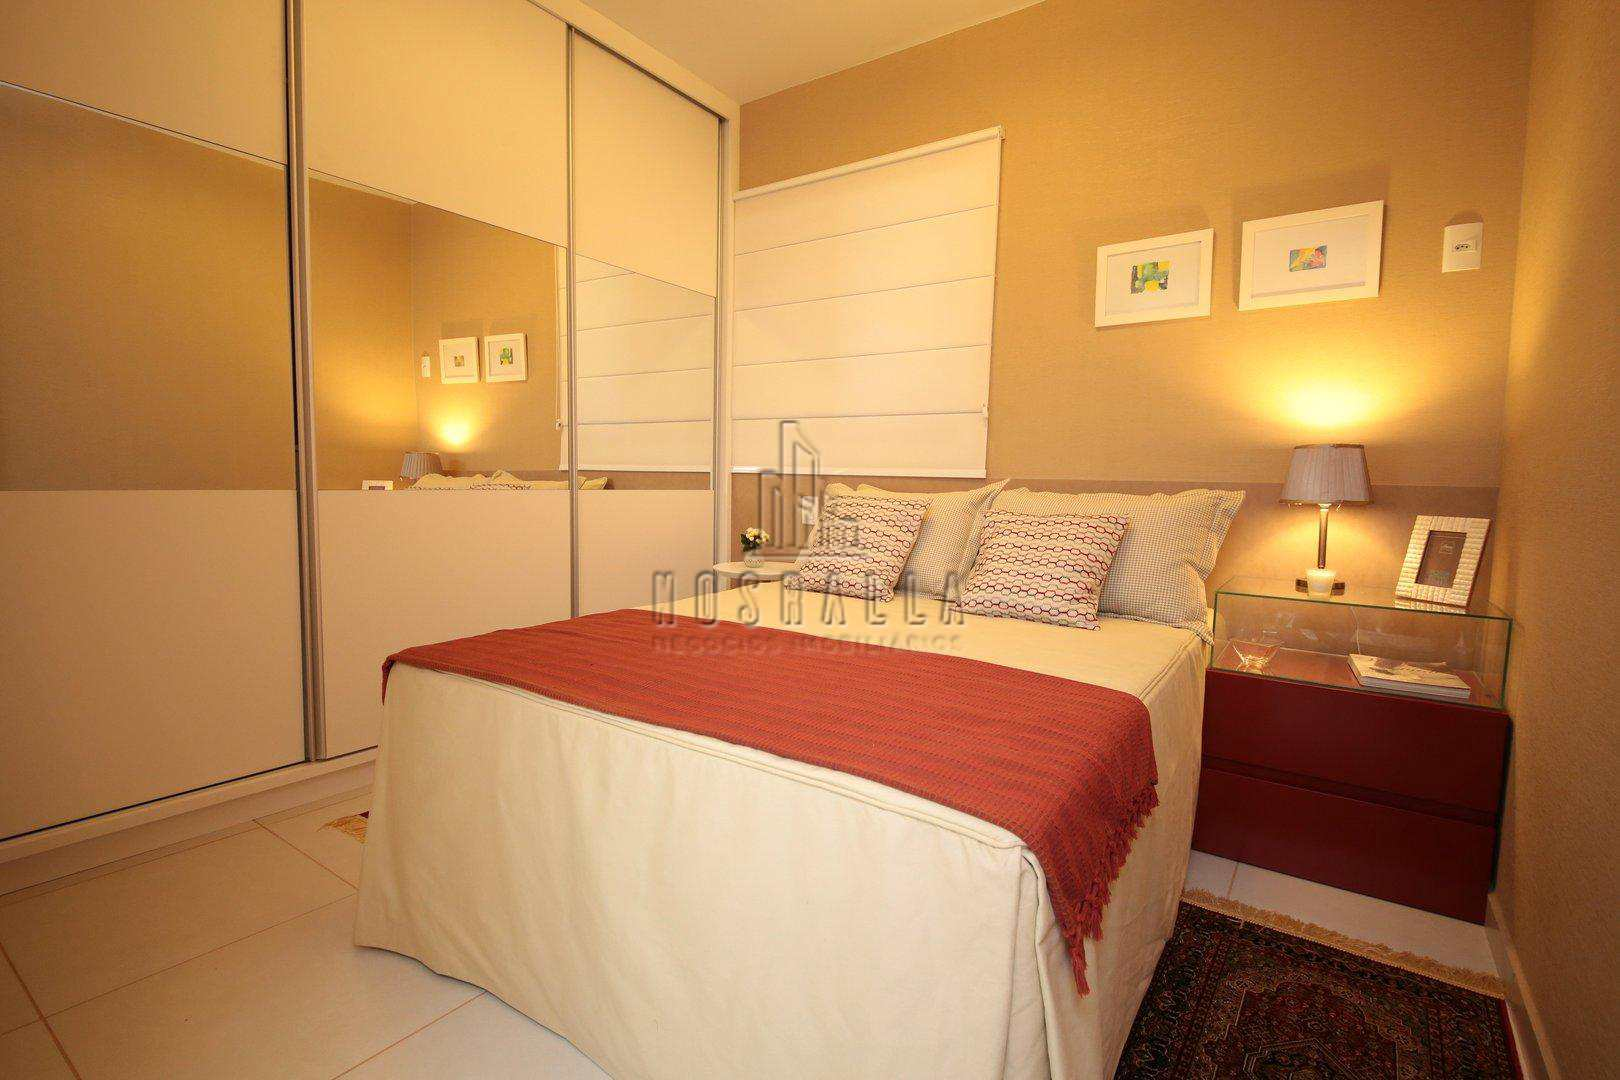 suite-casal-decorado-1.JPG.1920x1080_q85